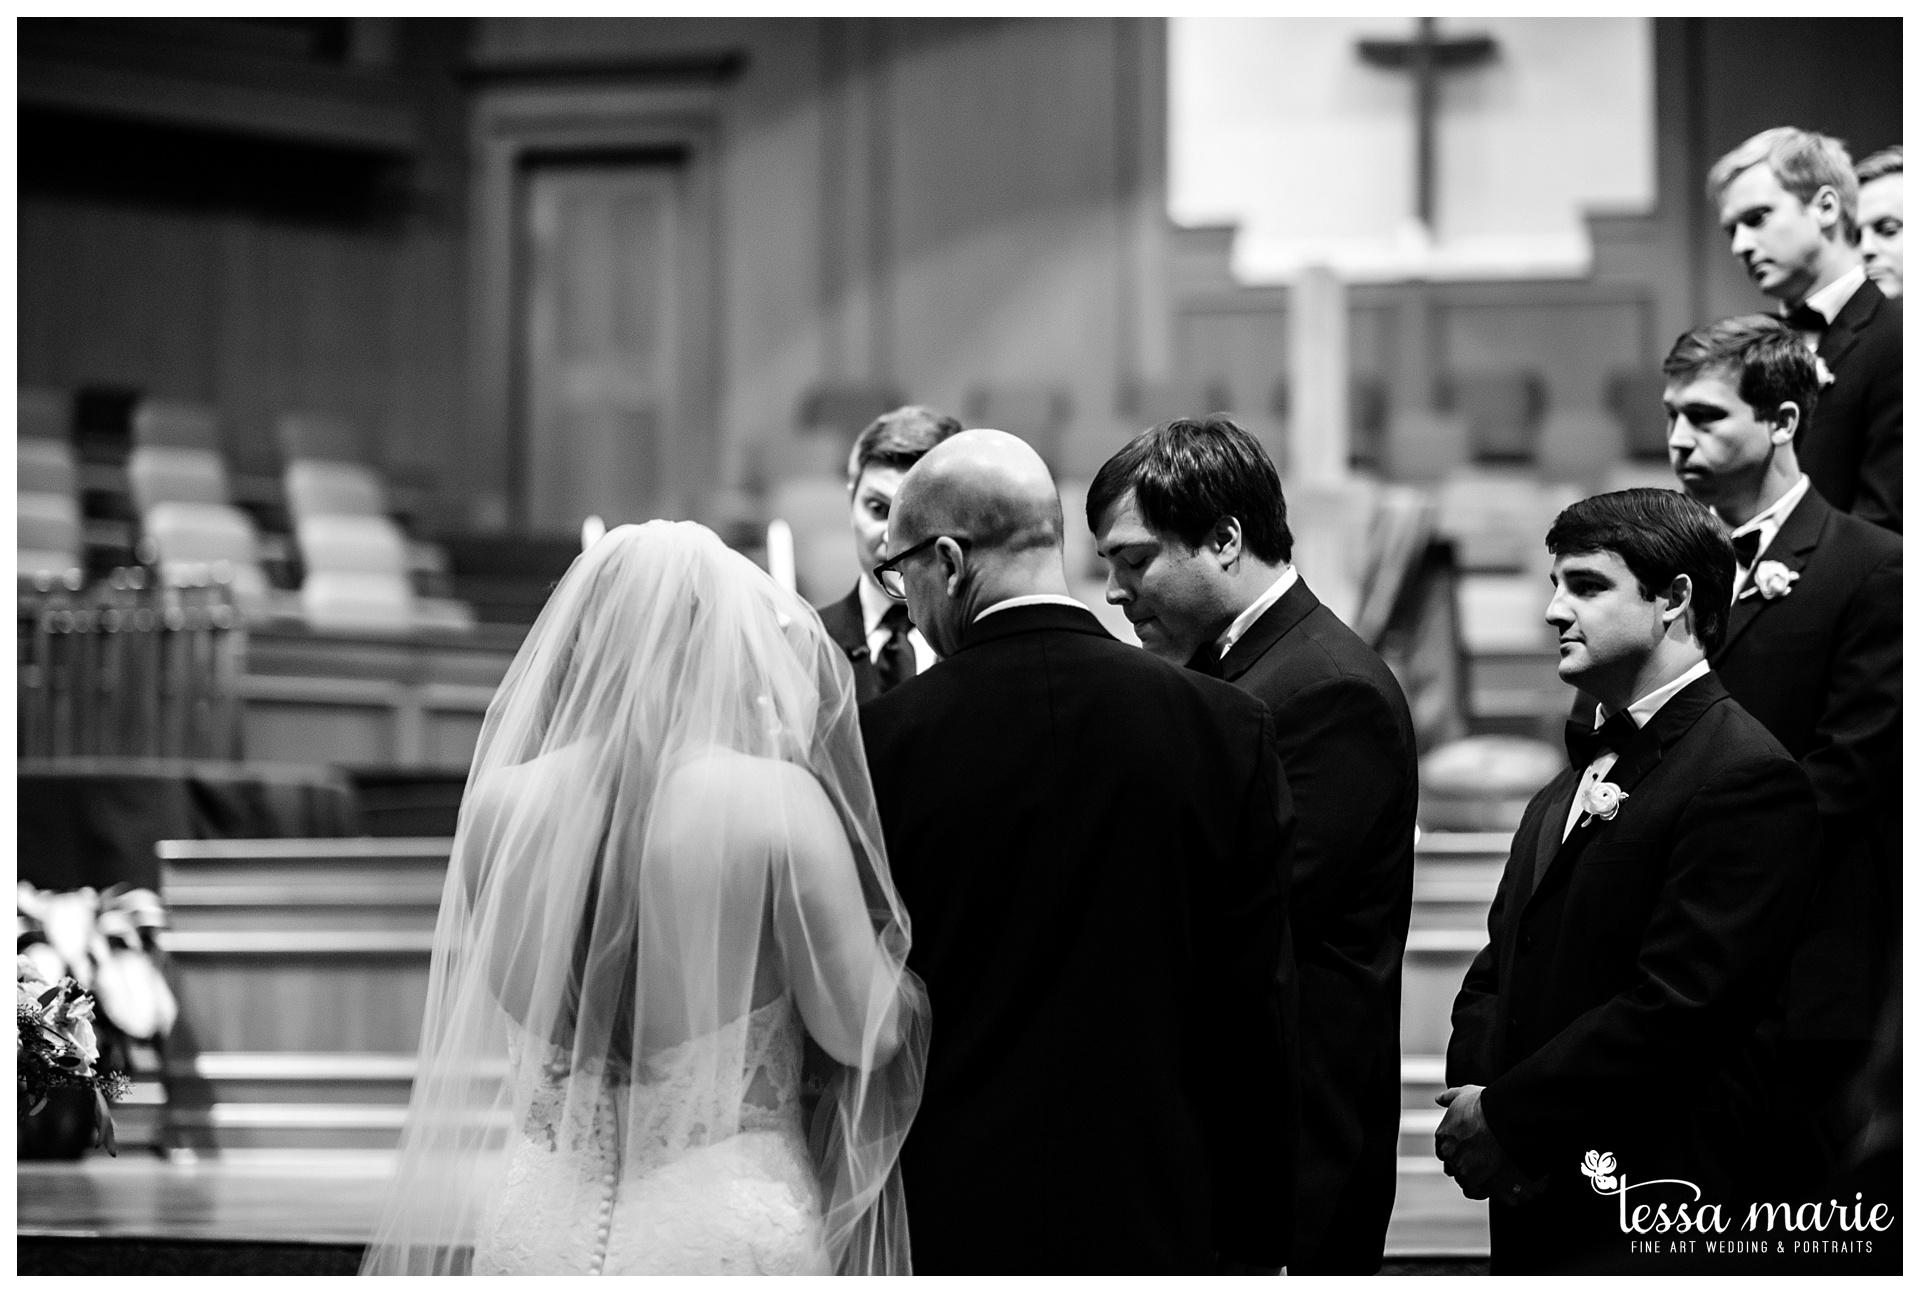 tessa_marie_weddings_legacy_story_focused_wedding_pictures_atlanta_wedding_photographer_0113